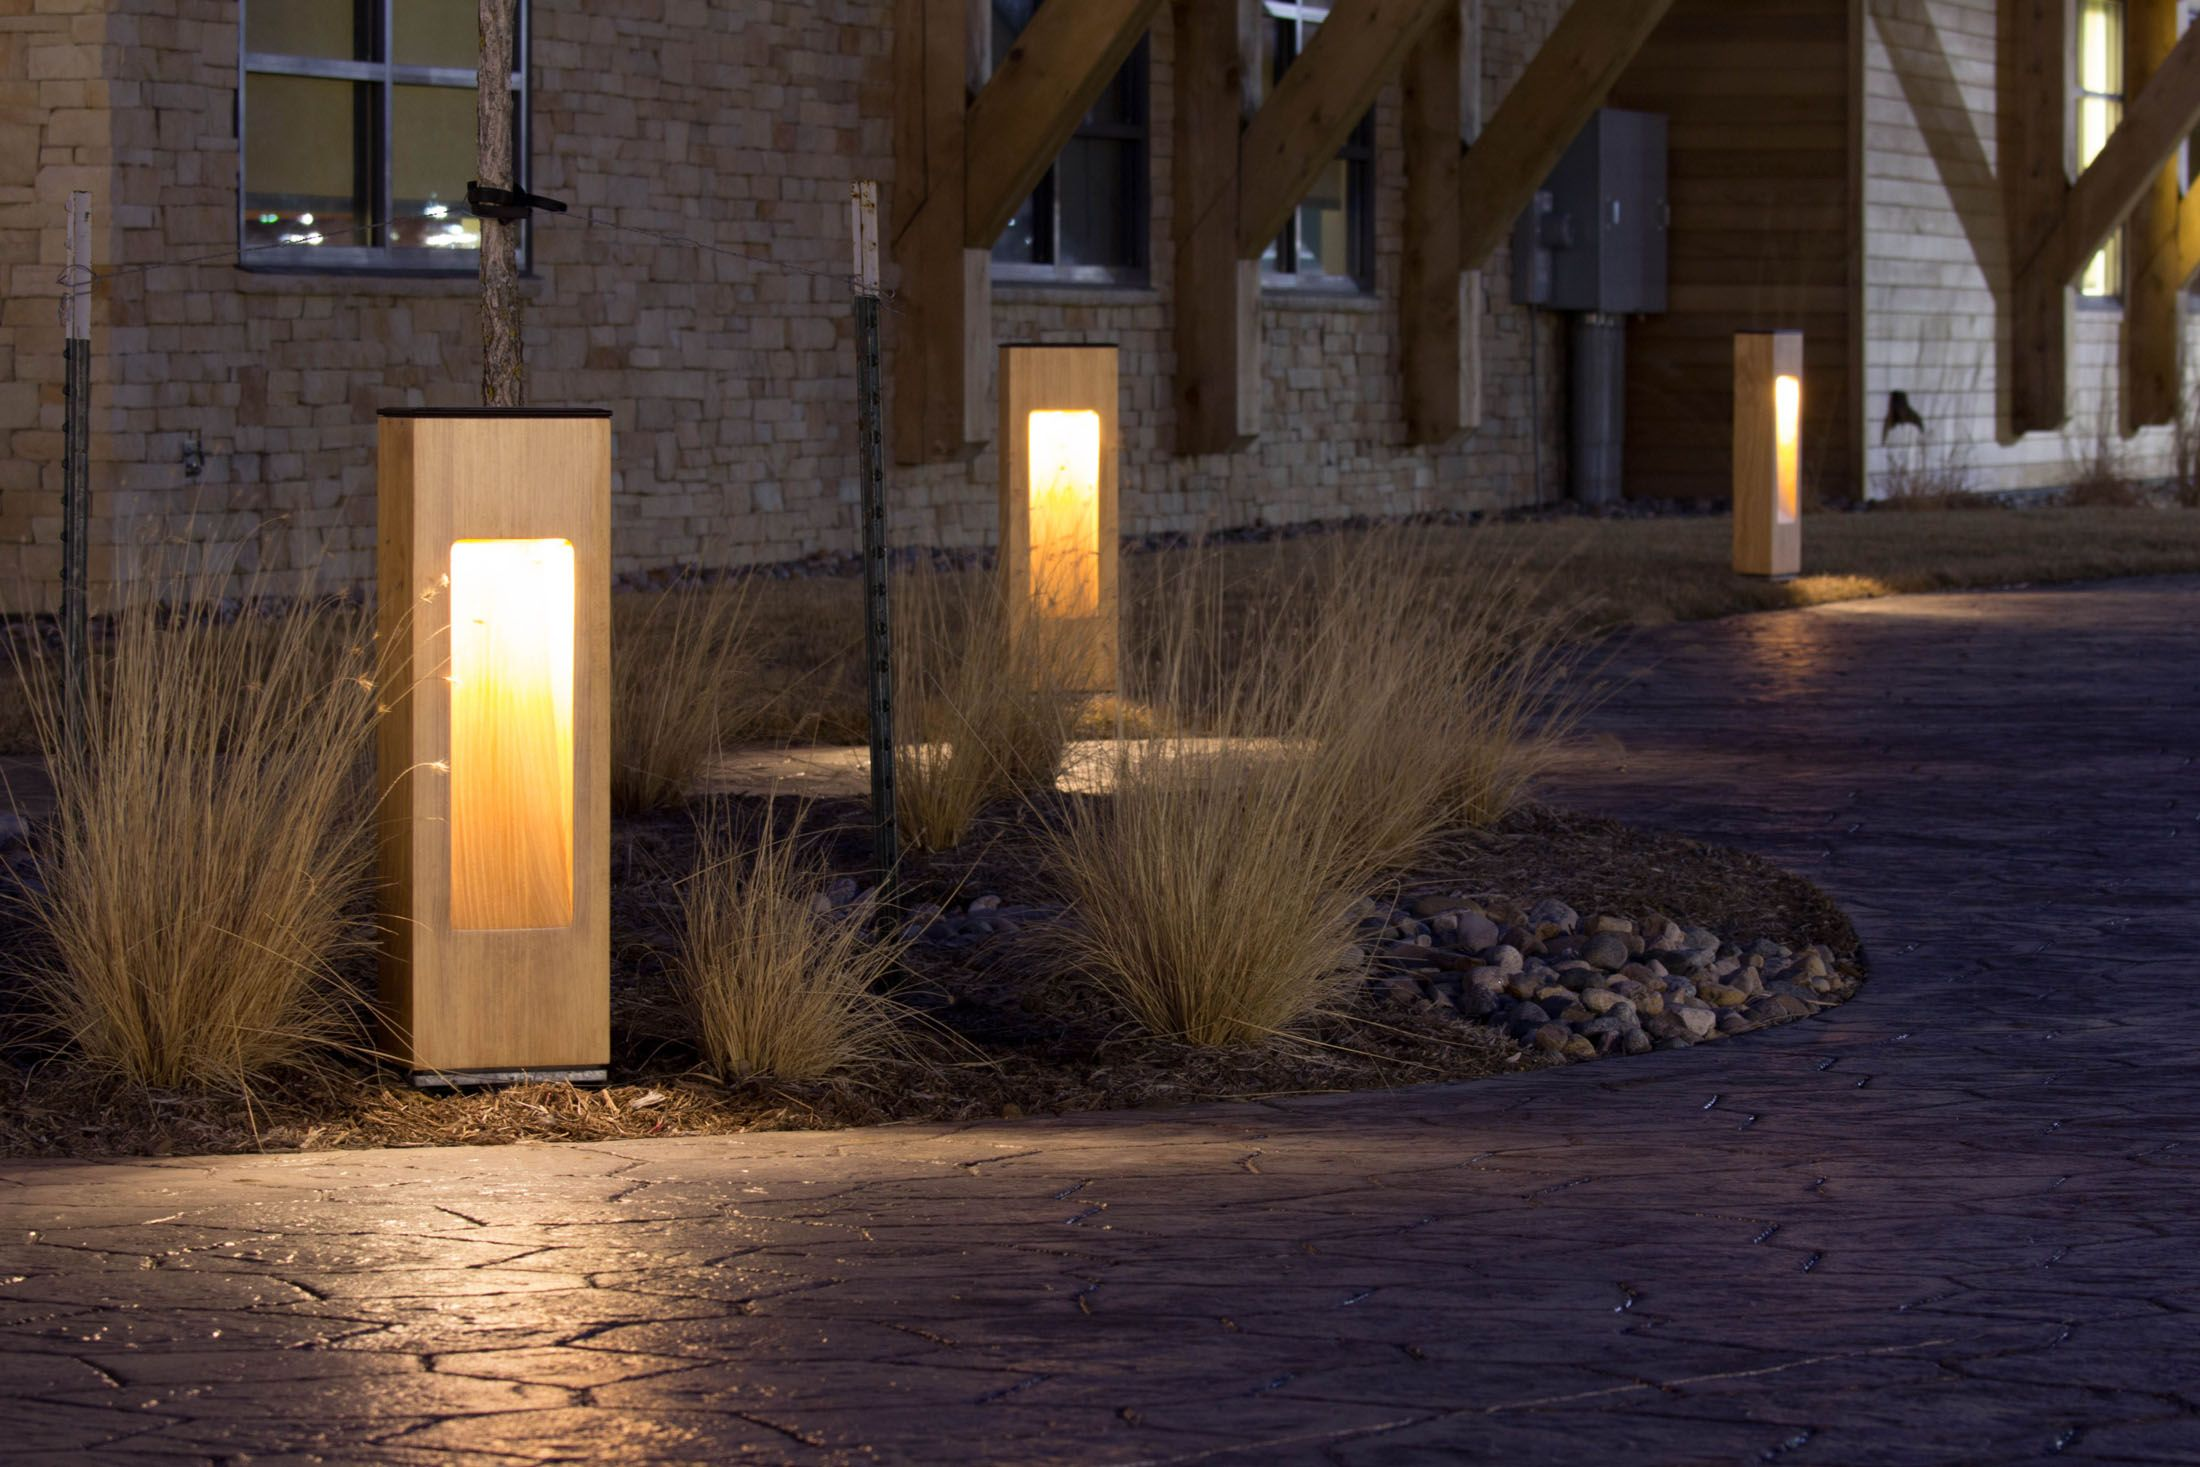 Up To Date News Coverage Of First Light Technologies Solar Landscape Lighting Exterior Lighting Urban Lighting